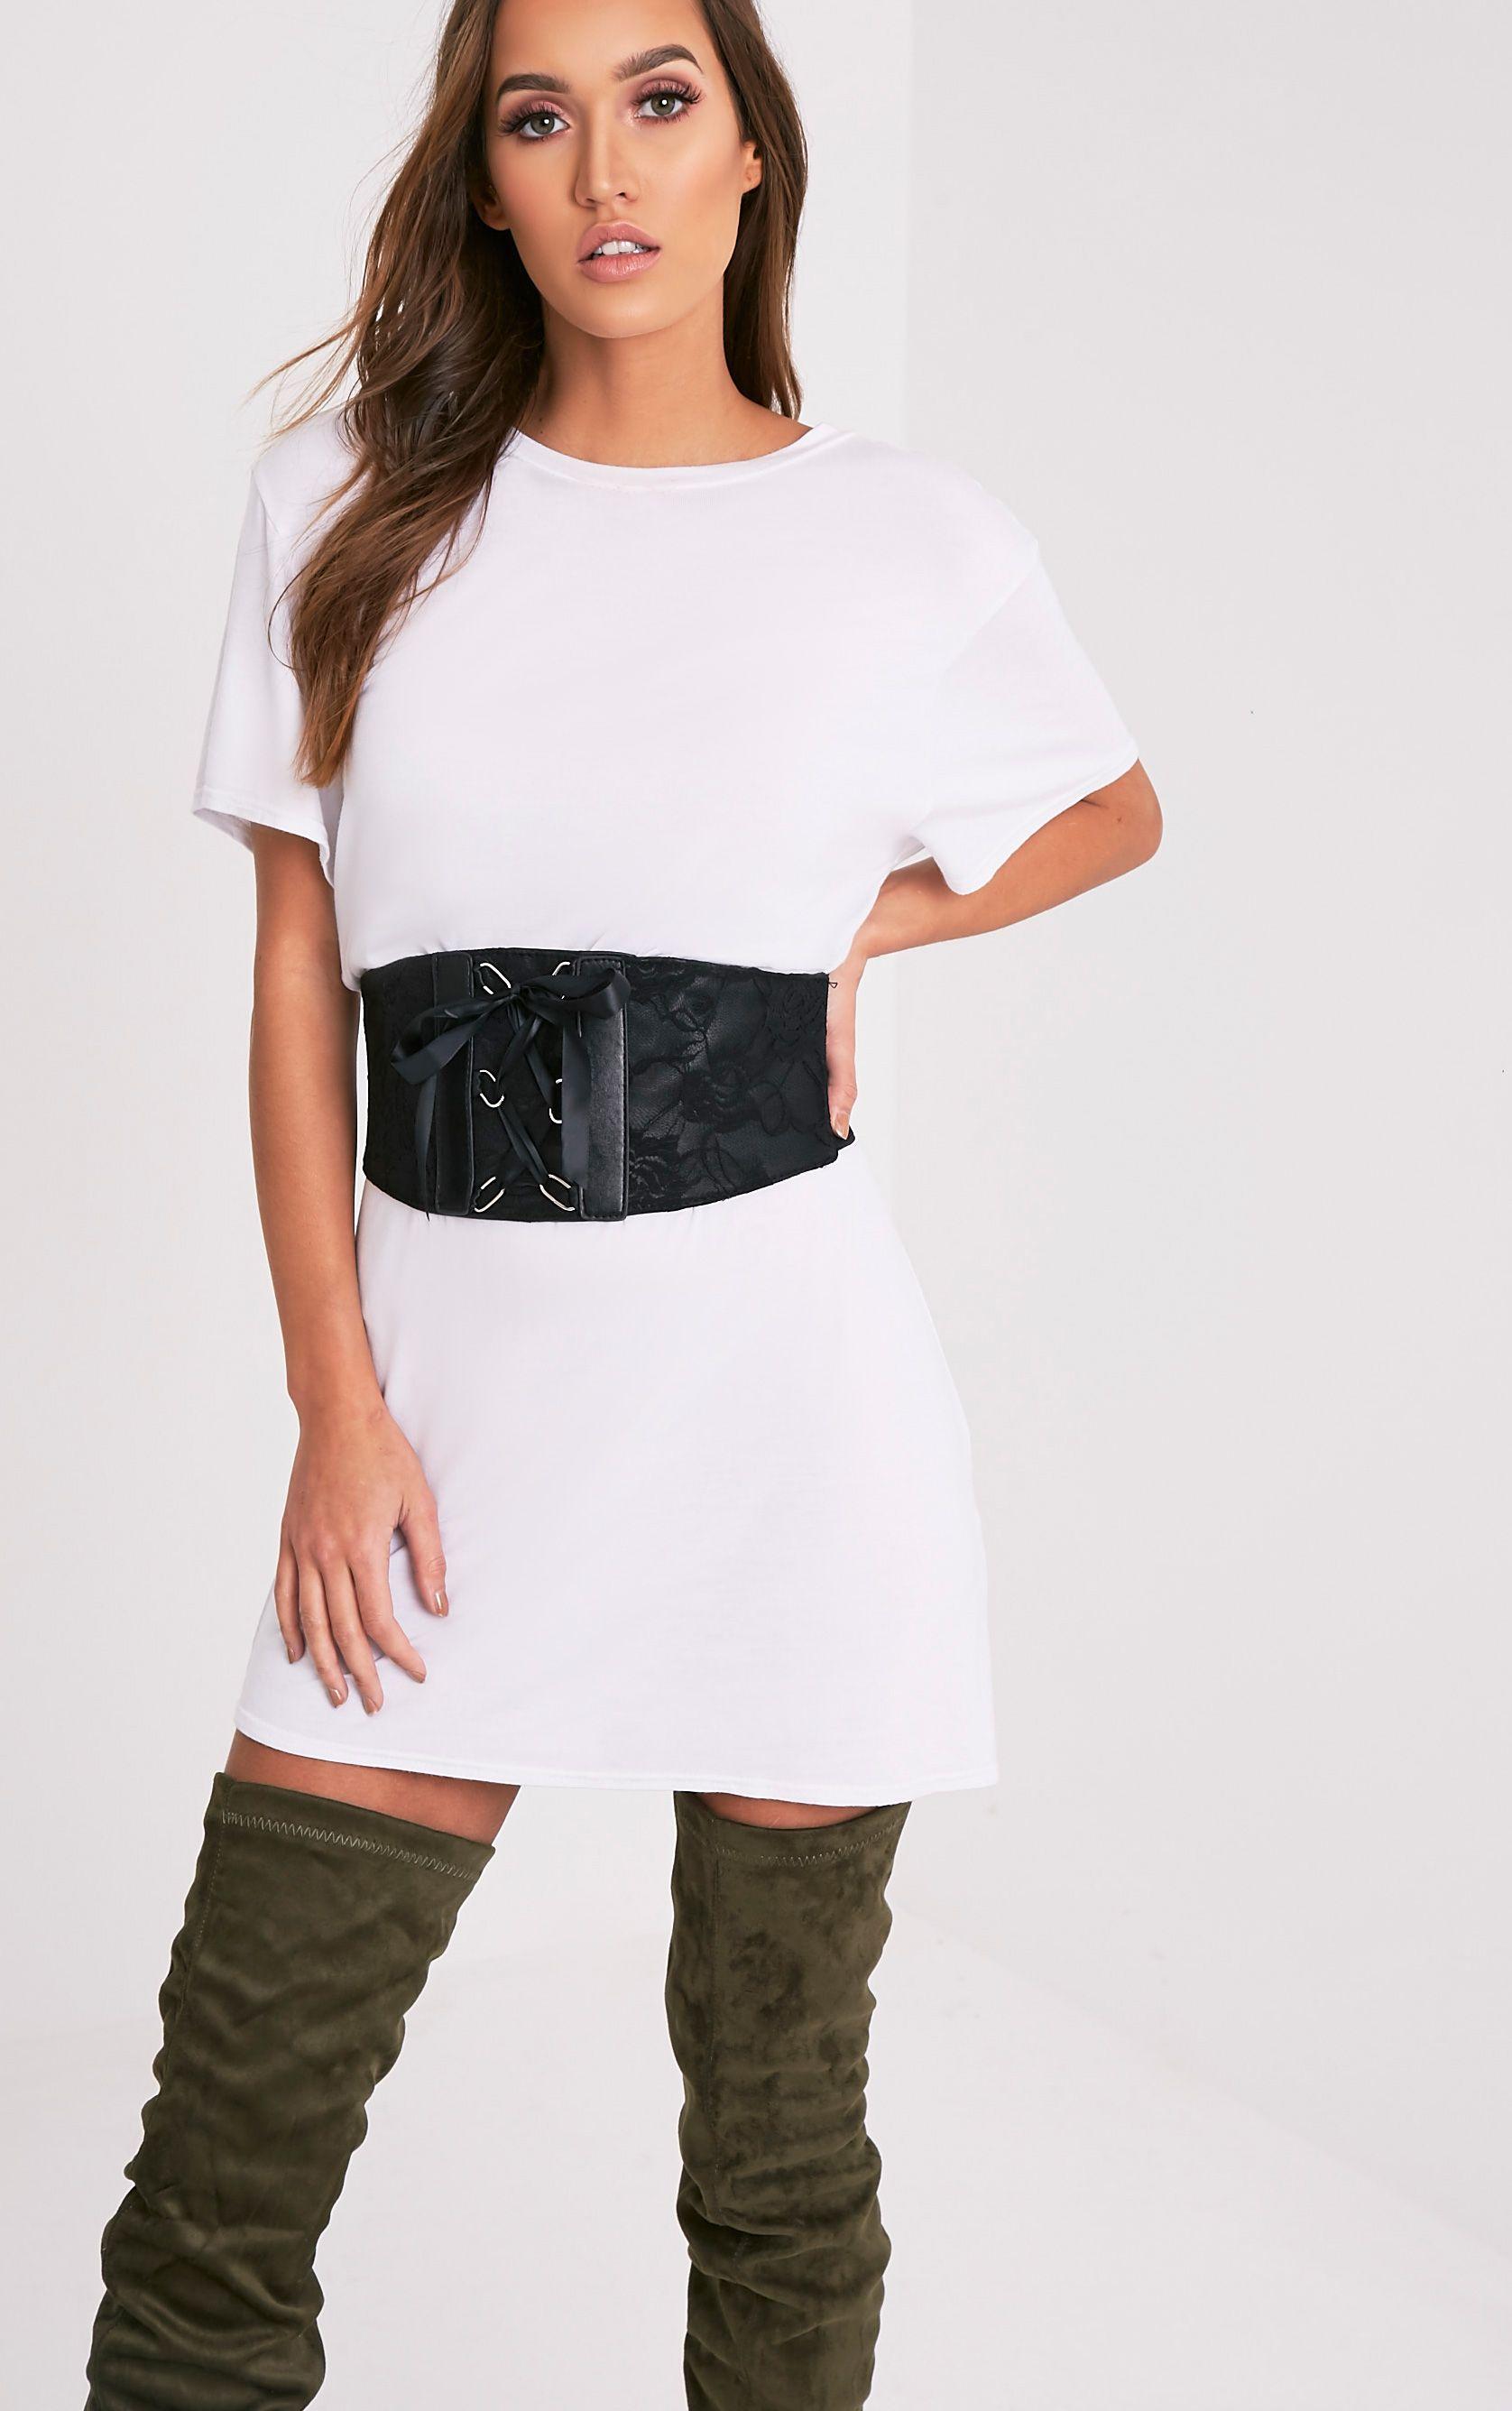 Mista Black Corset Style Belt